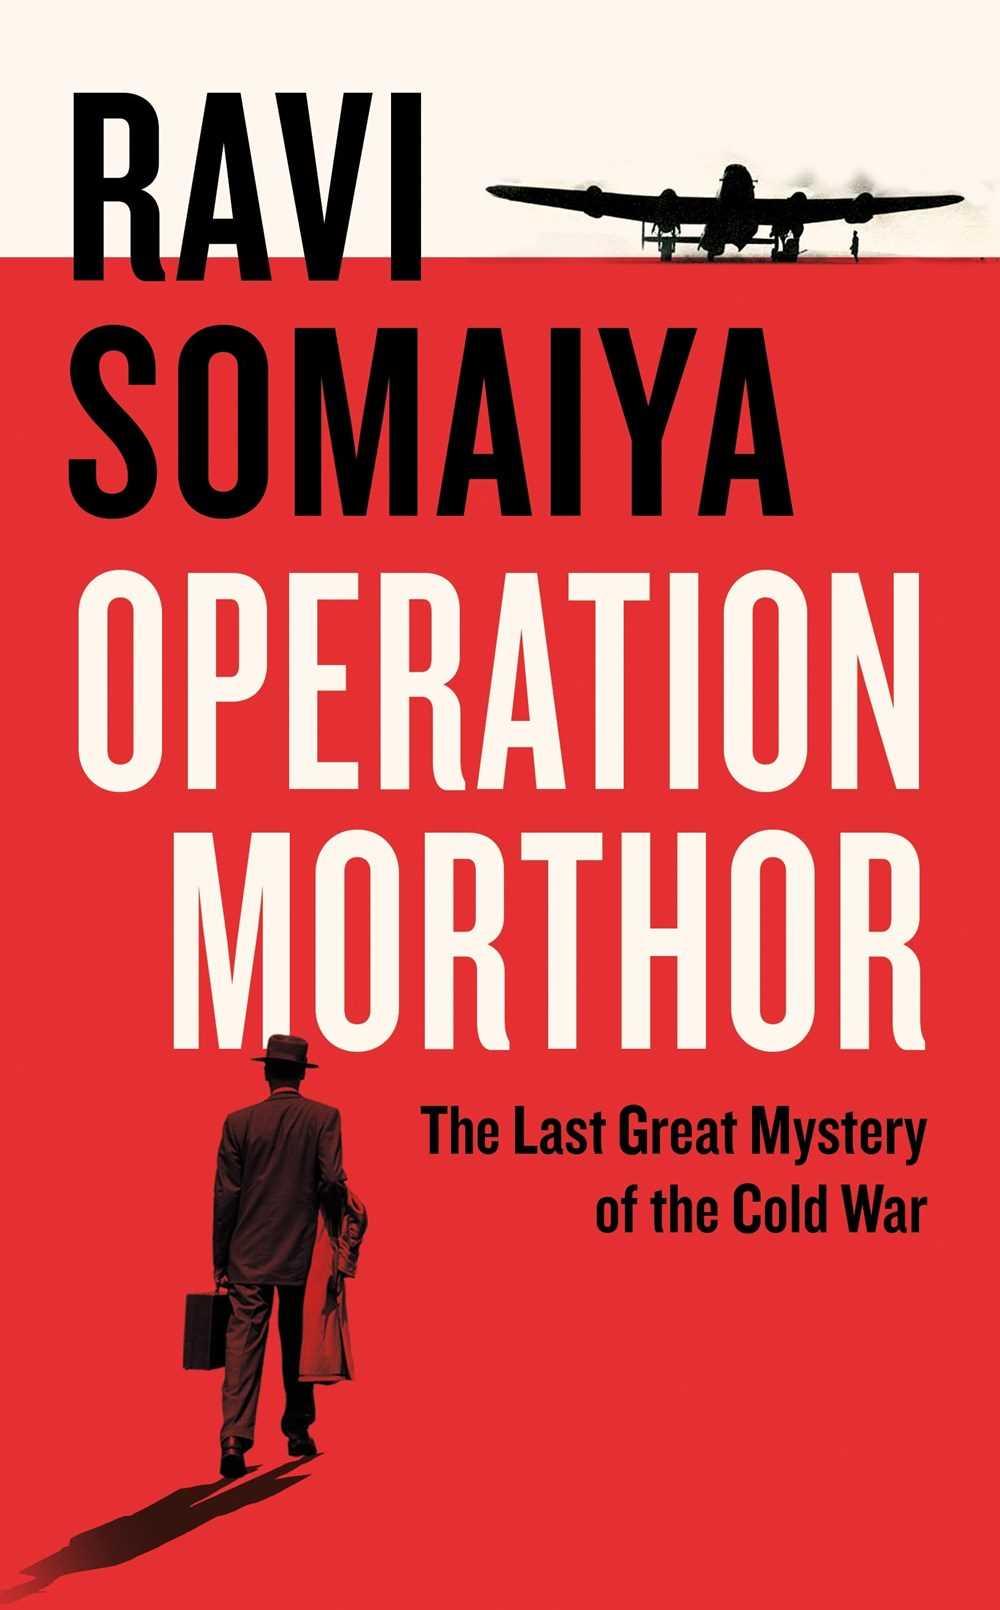 Operation Morthor